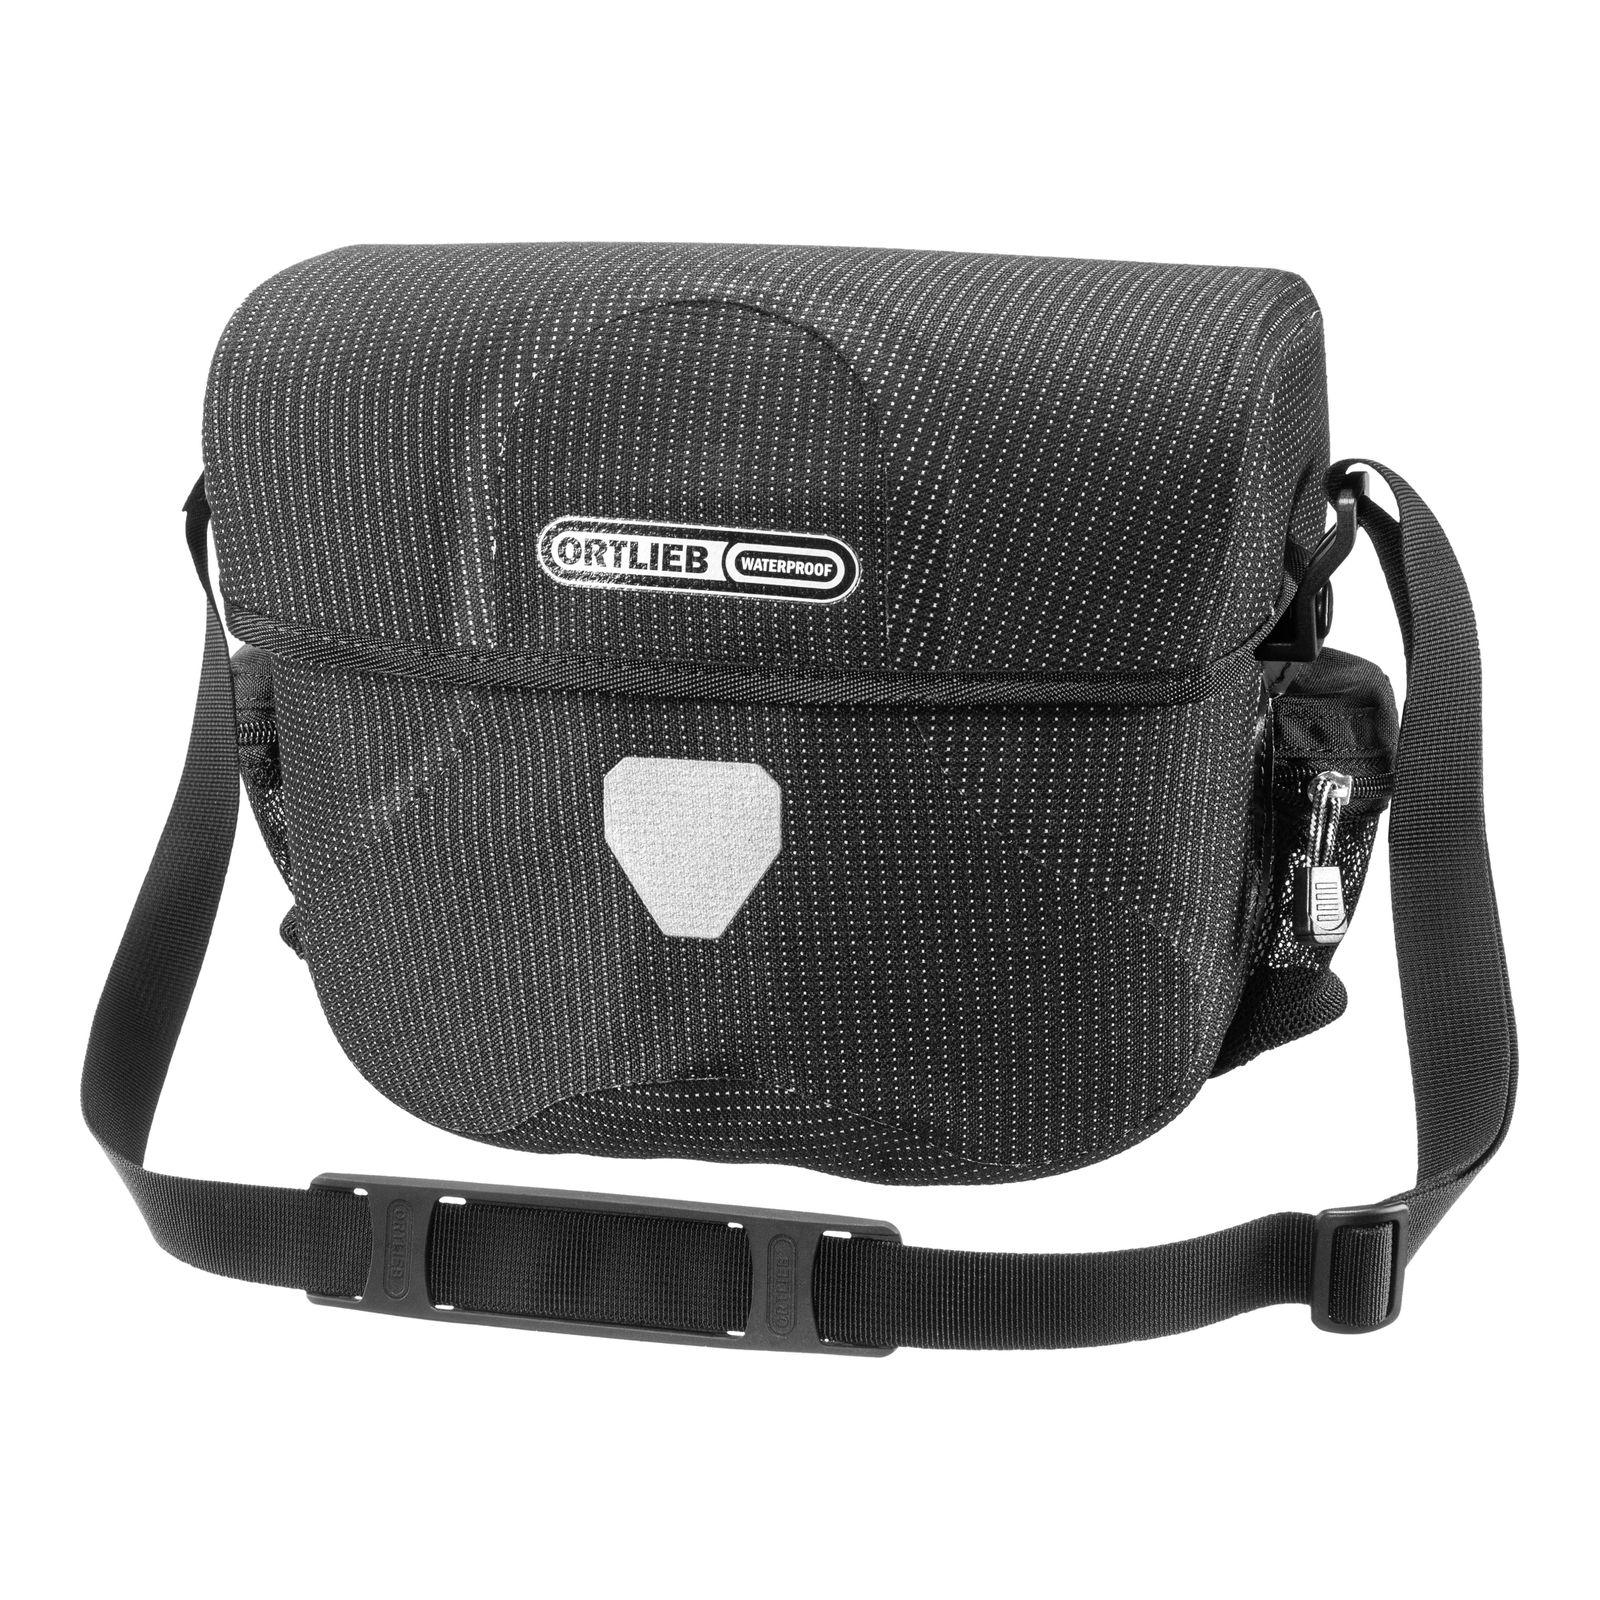 ORTLIEB High Visibility Ultimate Six Bike Handlebar Bag 7L Black Reflective